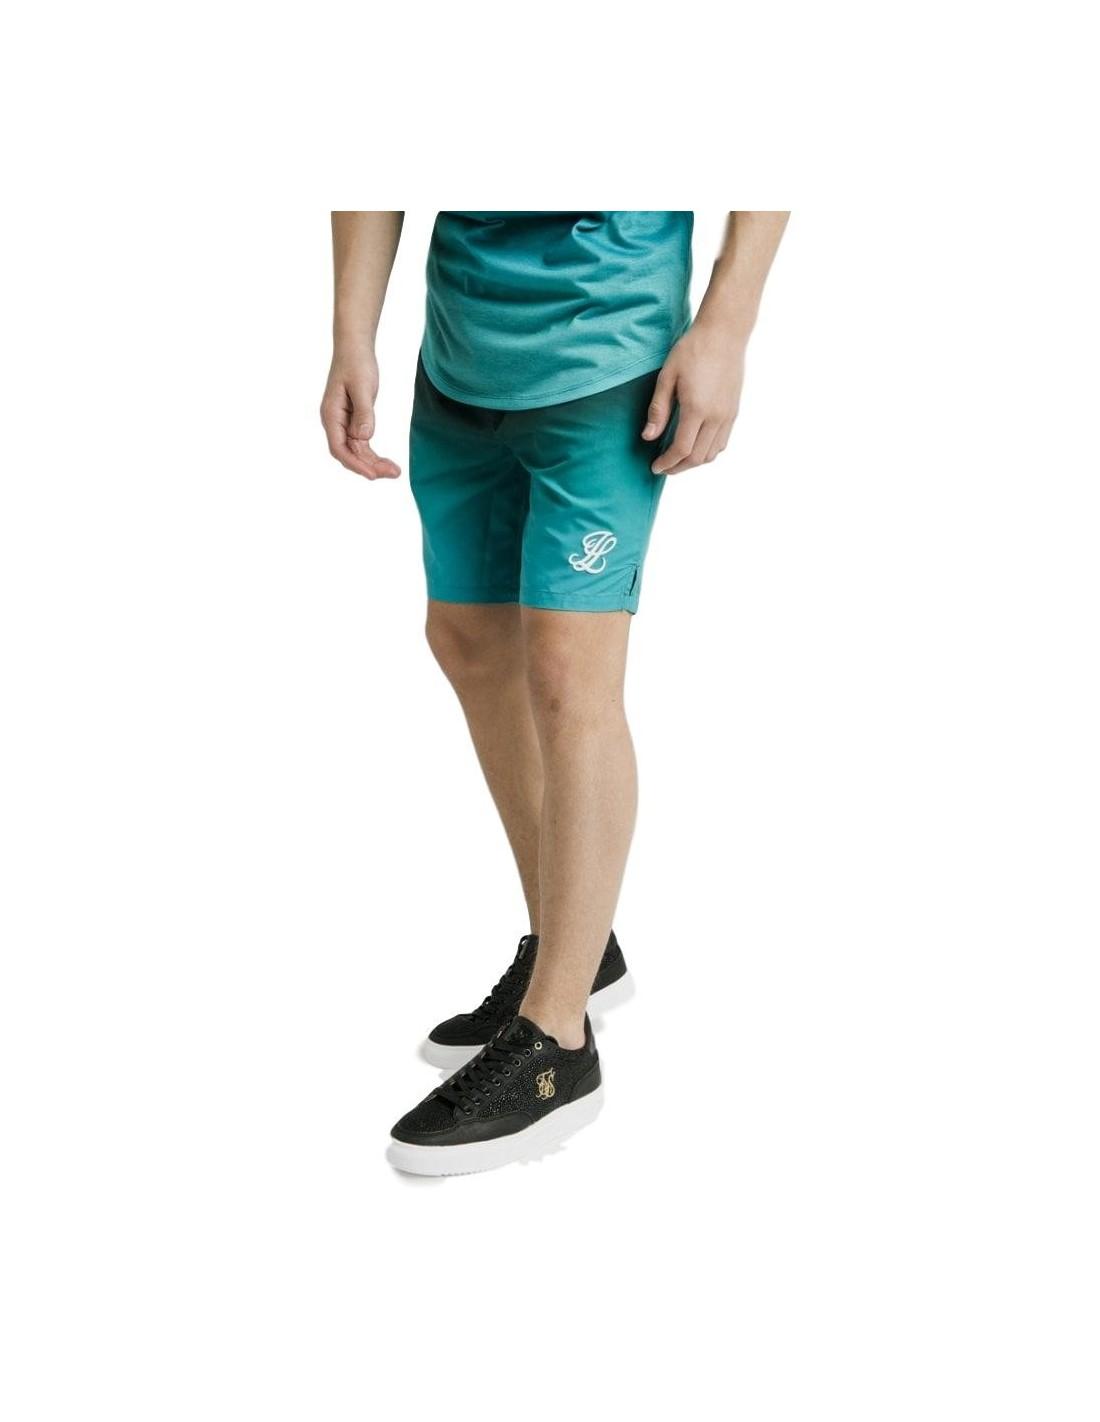 Pantalon Chandal SikSilk Con Cordón Logotipo Bordado Muslo.